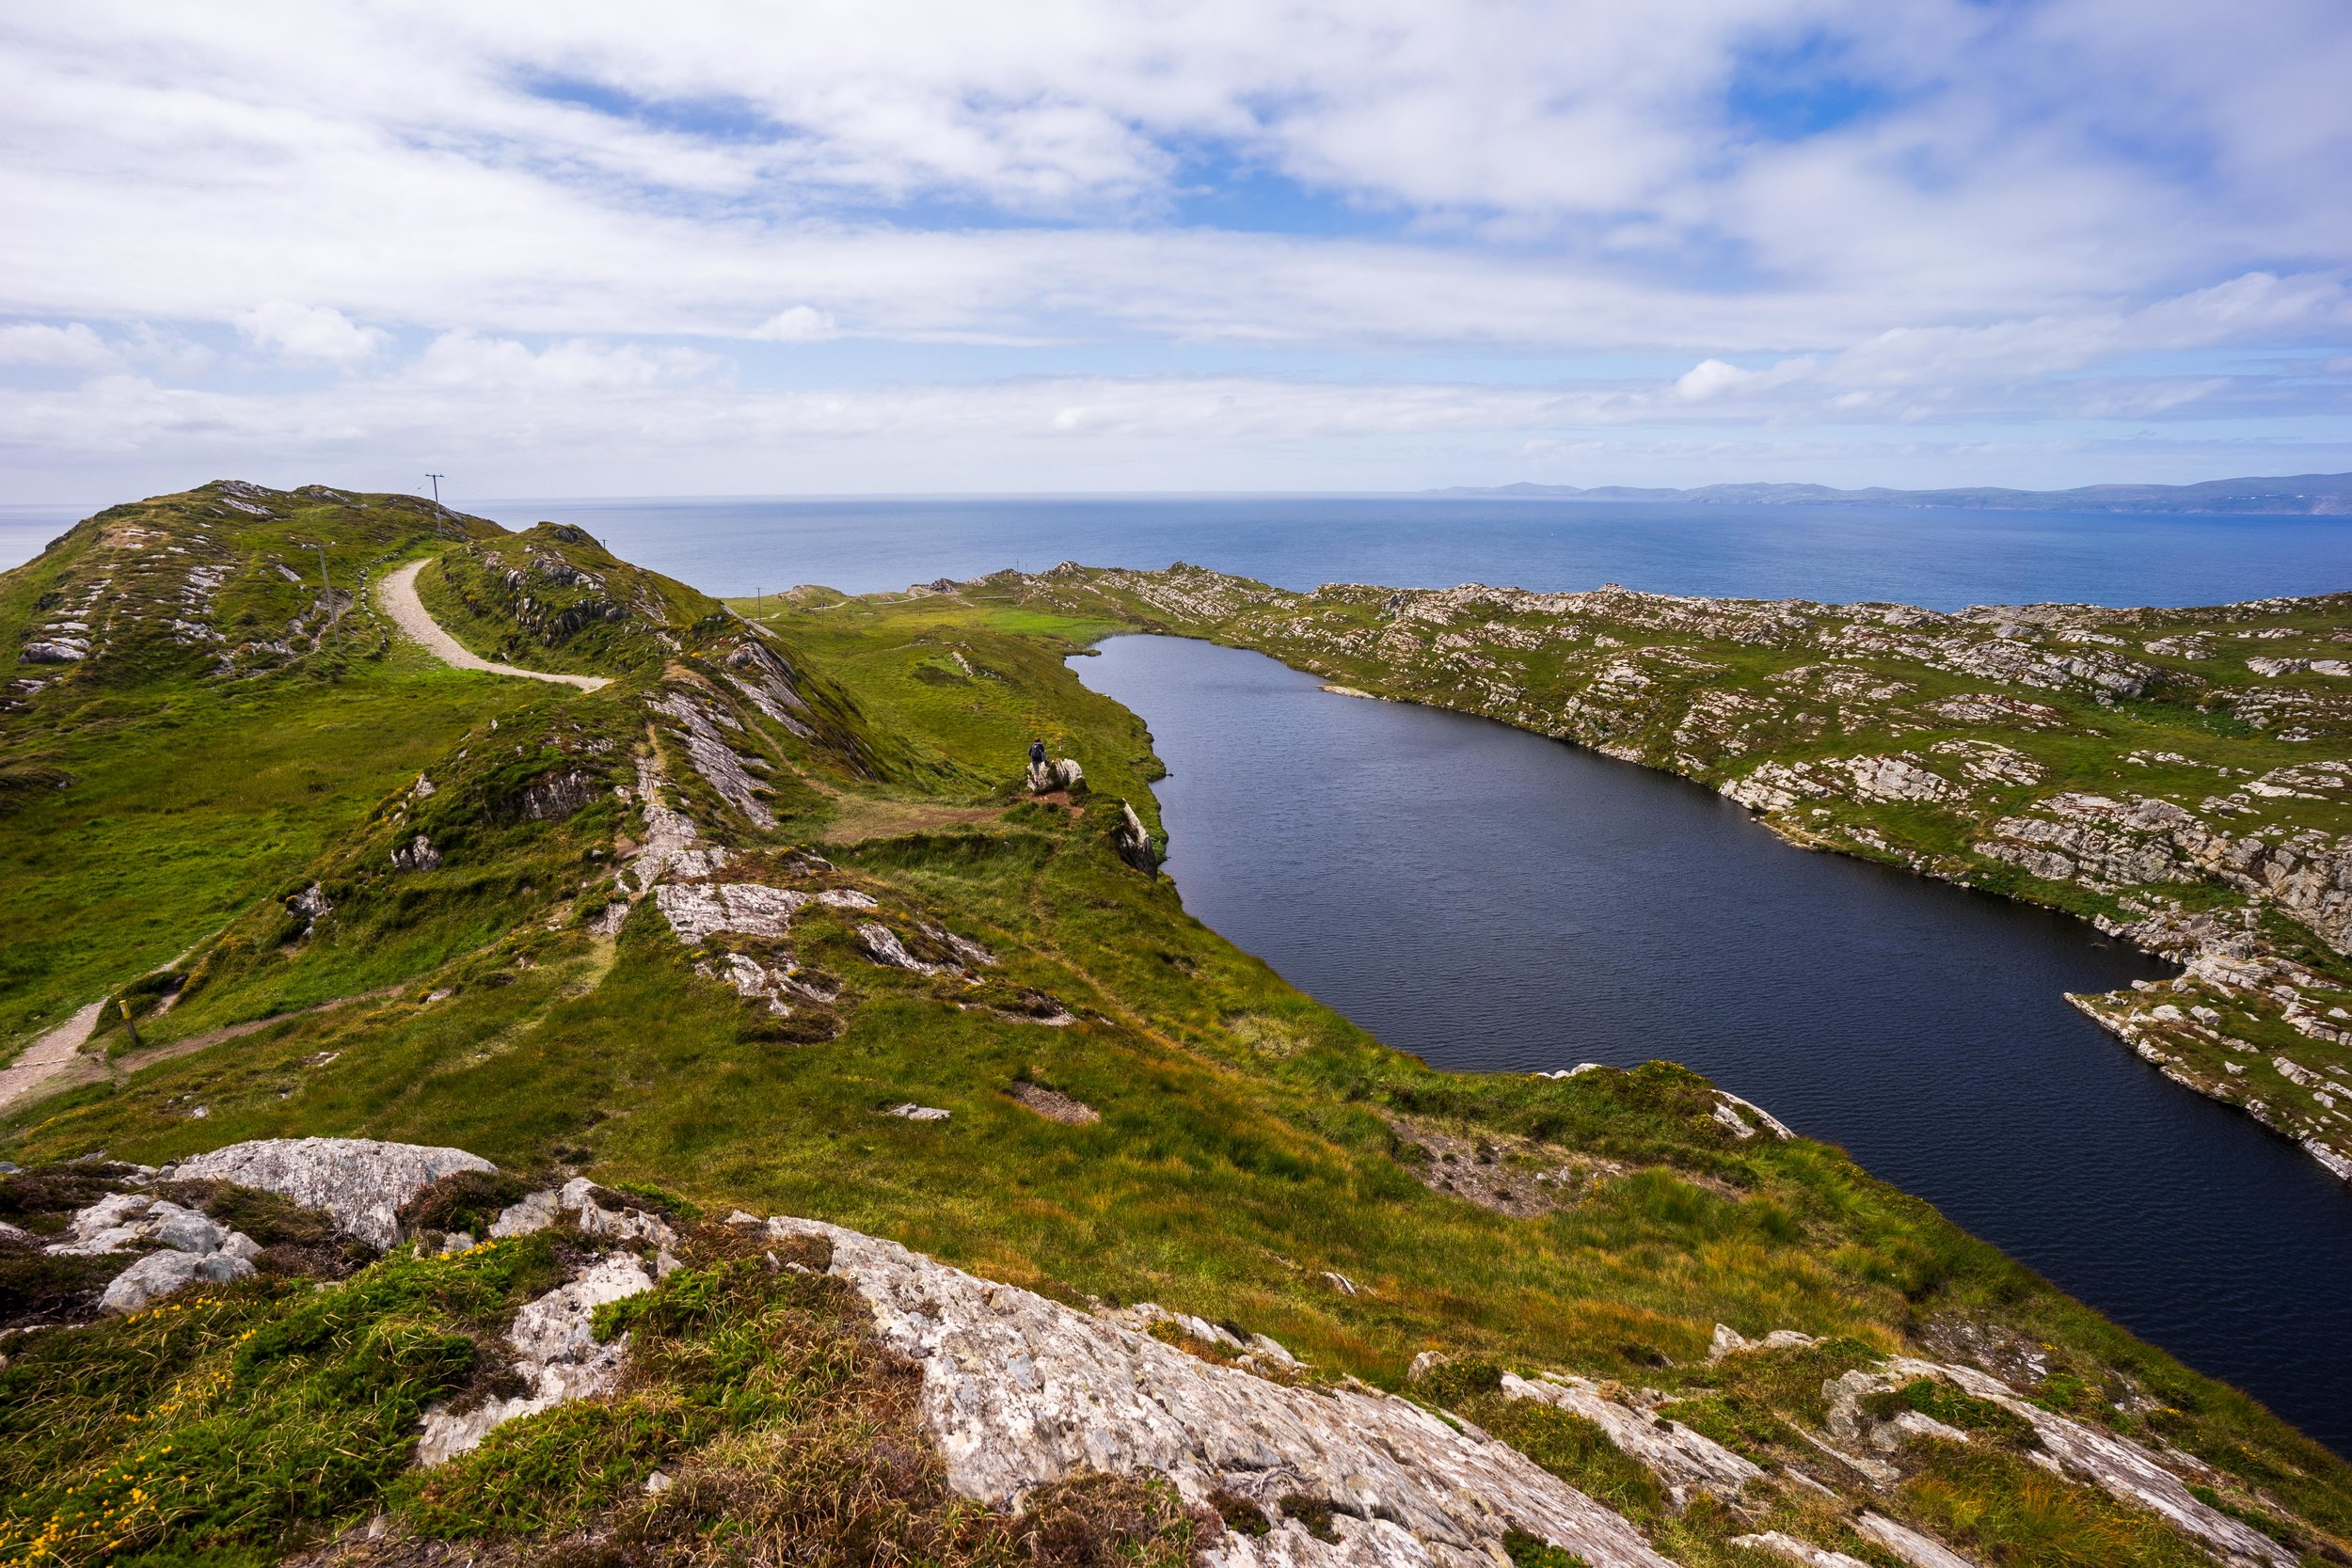 county cork. cork. ireland. irish. history. city. house sitting. old. travel. travel photography. travel photographer. lough hyne. hiking. outdoor. adventure. hiking. camping. sheeps head hike.jpg